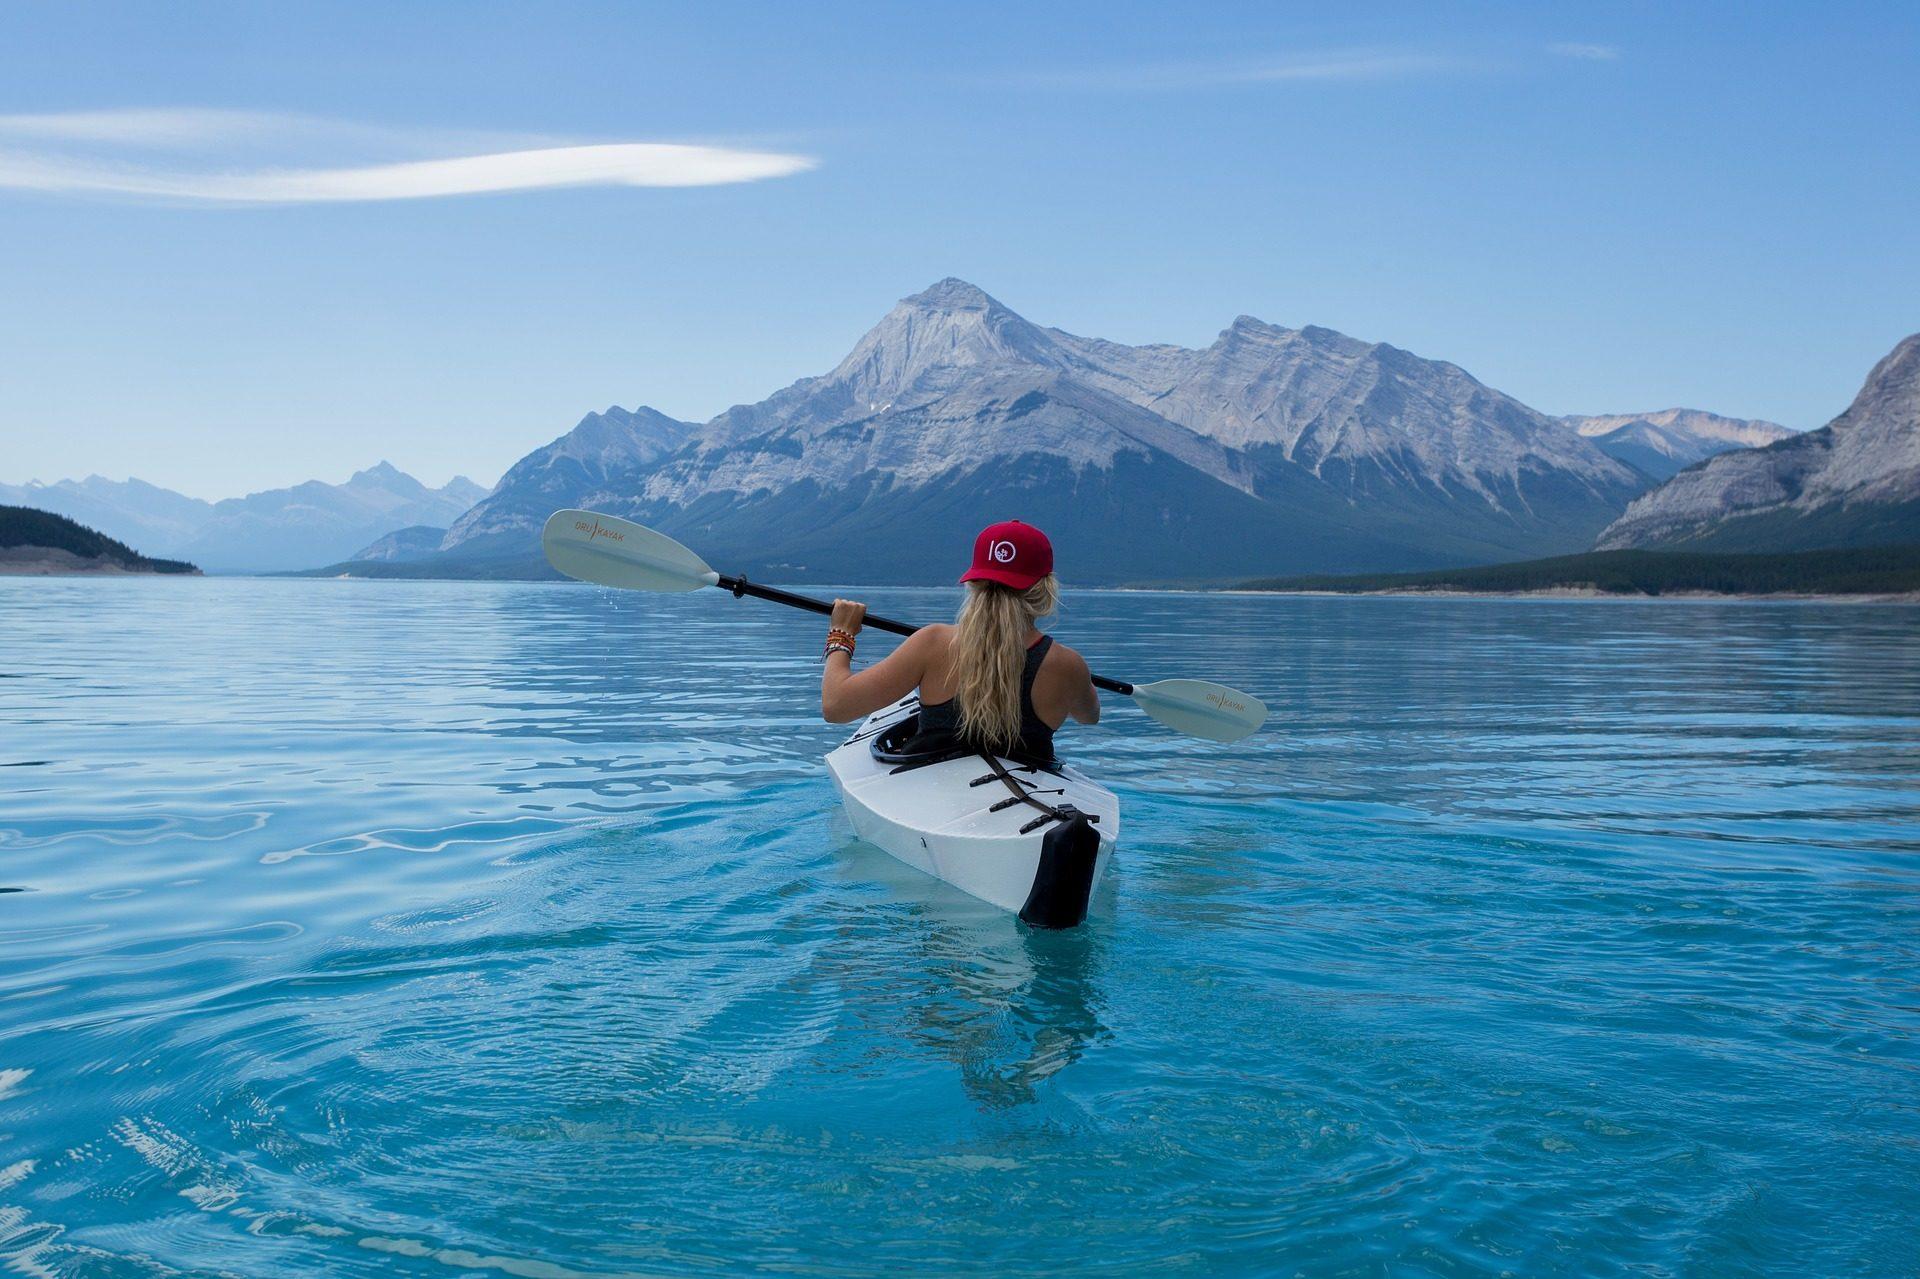 mujer, piragua, lago, remos, montañas - Fondos de Pantalla HD - professor-falken.com